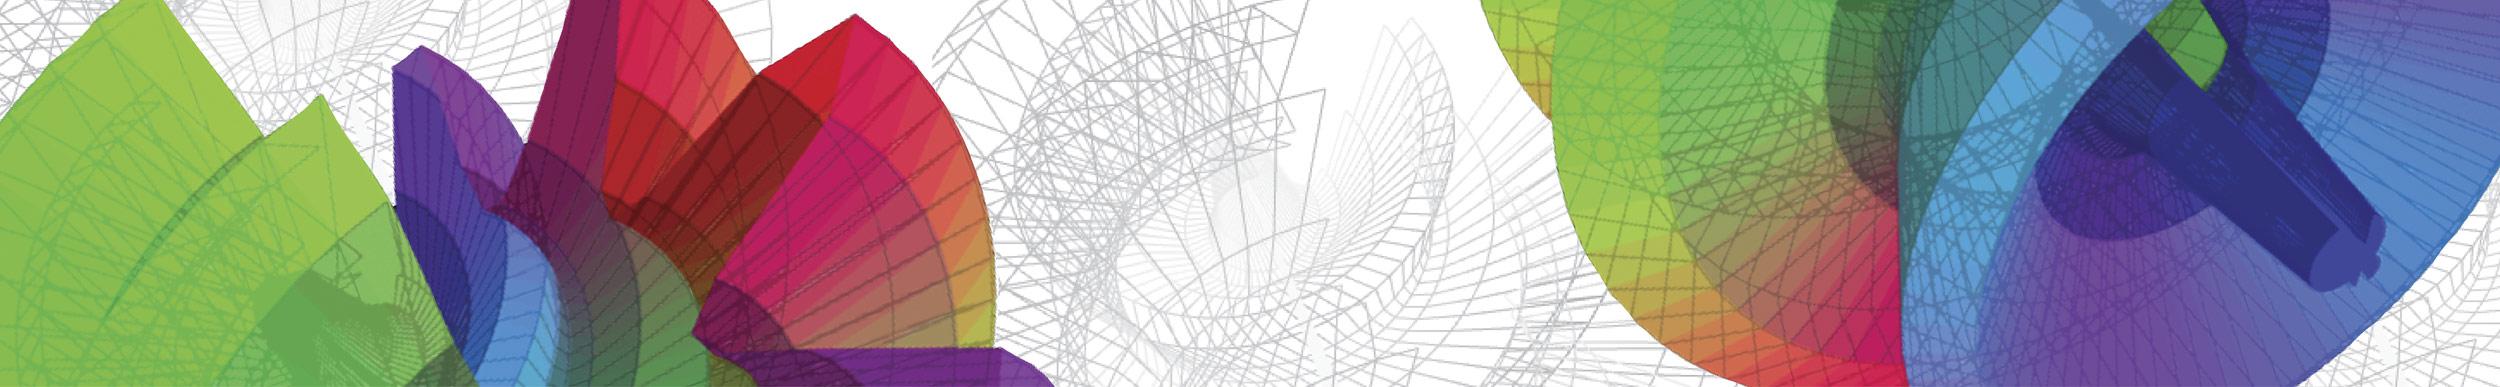 3DPrinting.Lighting_Prototyping 2015 Kortrijk